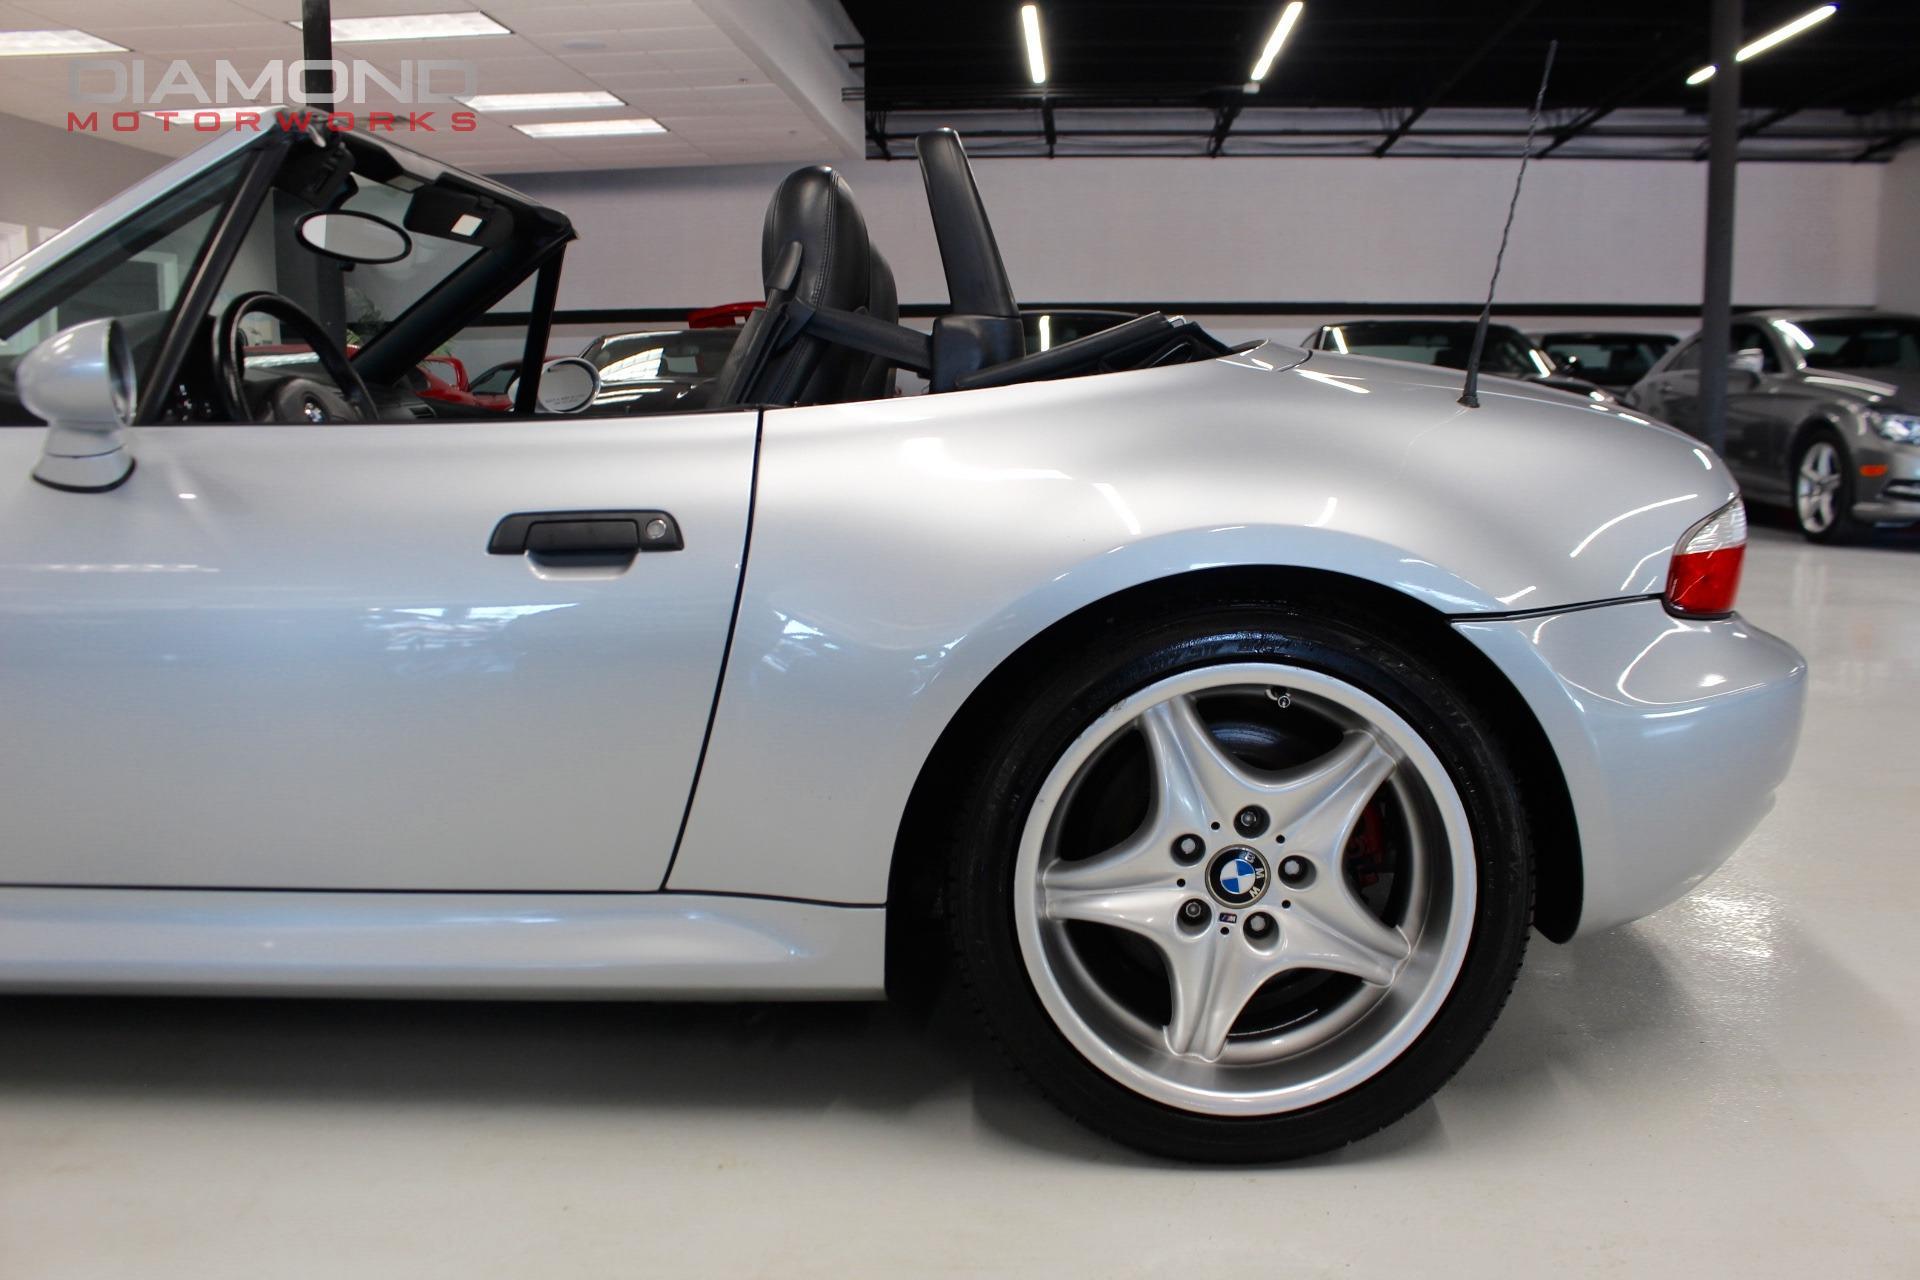 1999 Bmw Z3 M Roadster Stock C89075 For Sale Near Lisle